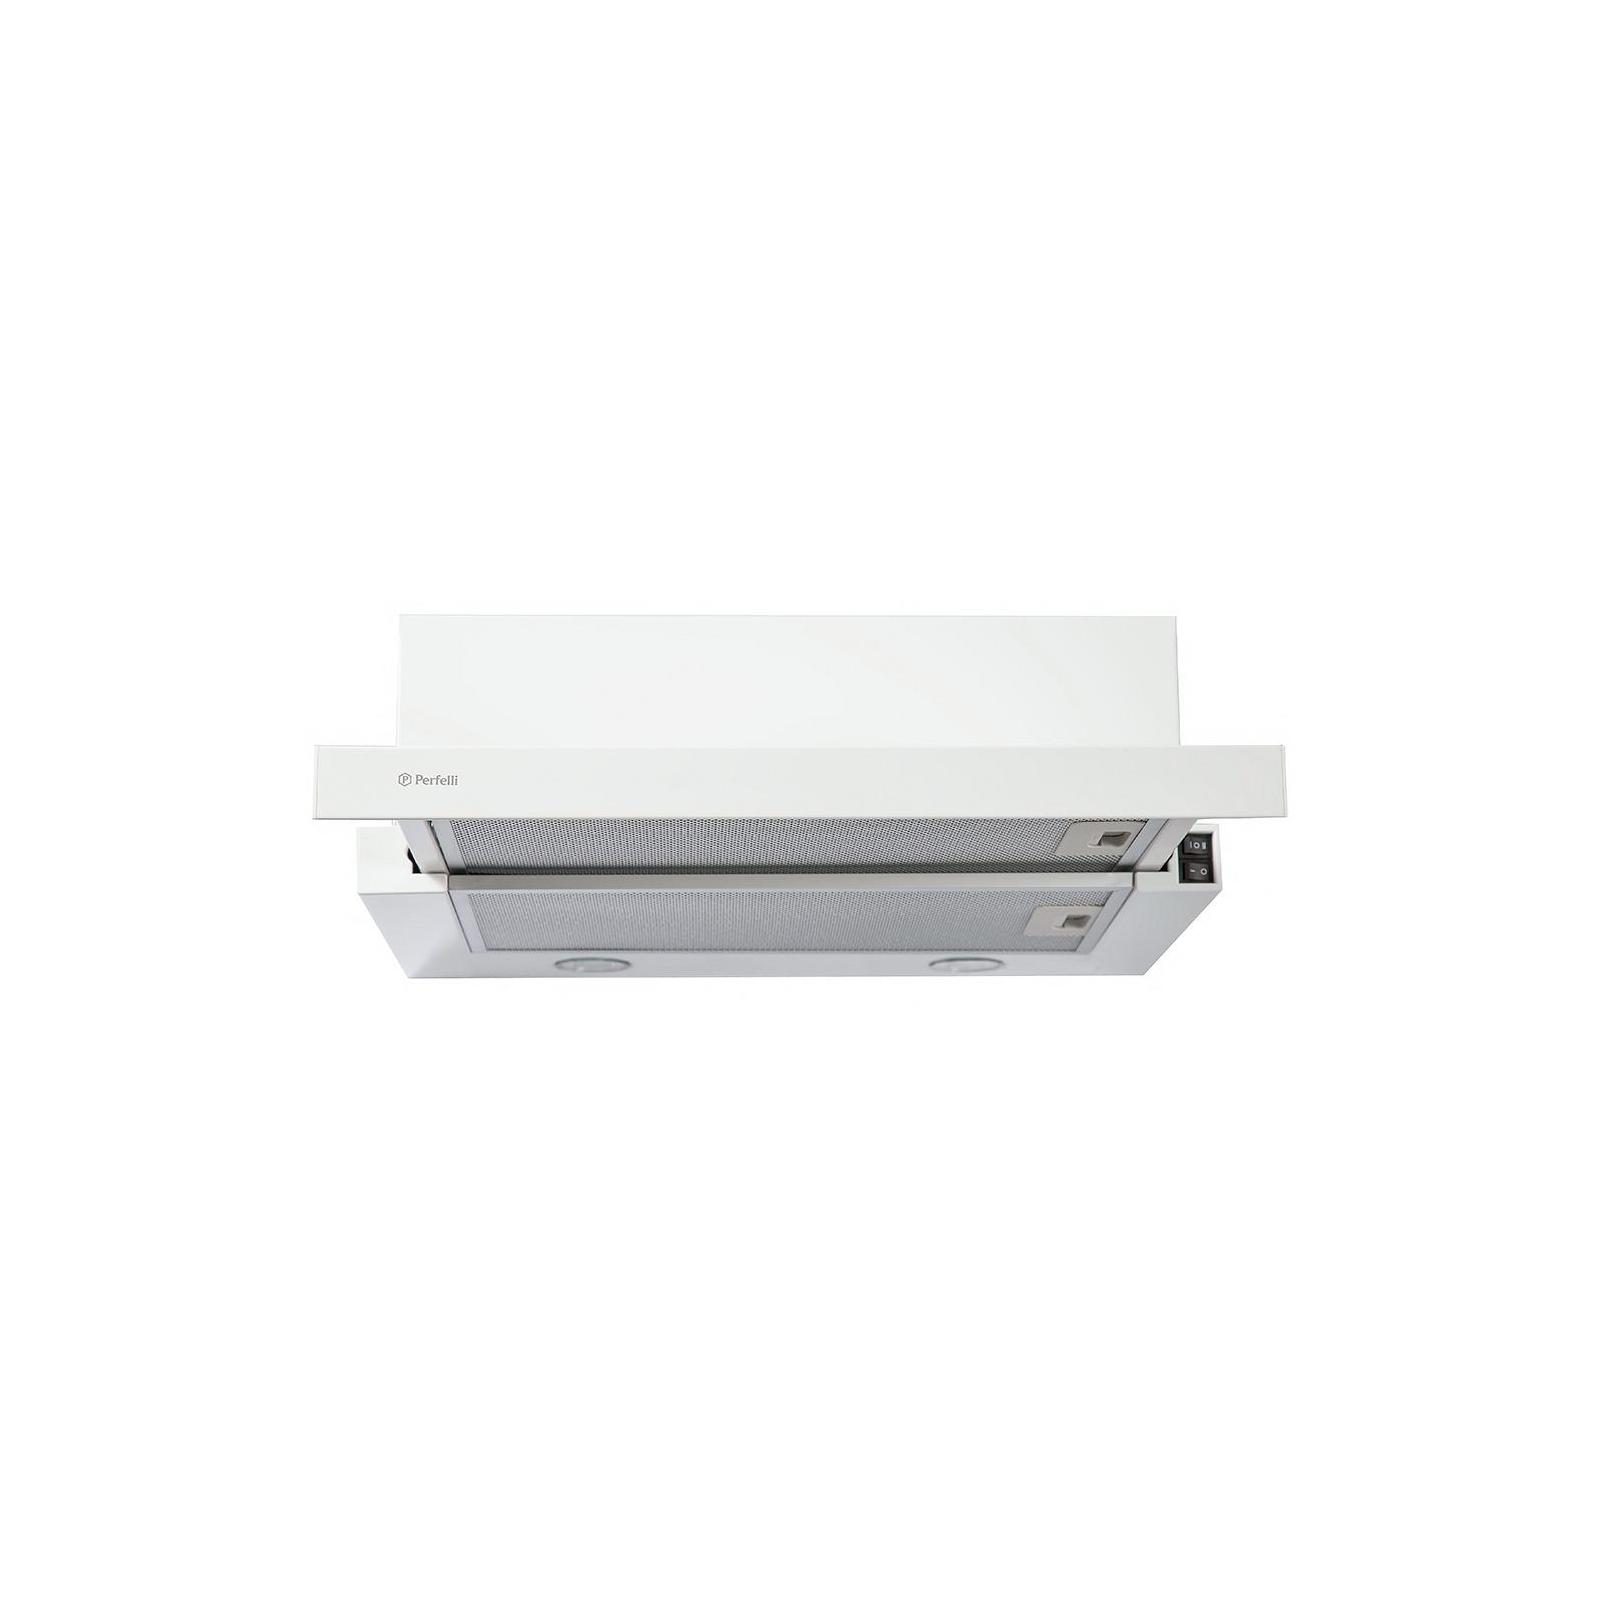 Вытяжка кухонная Perfelli TL 6112 IV LED